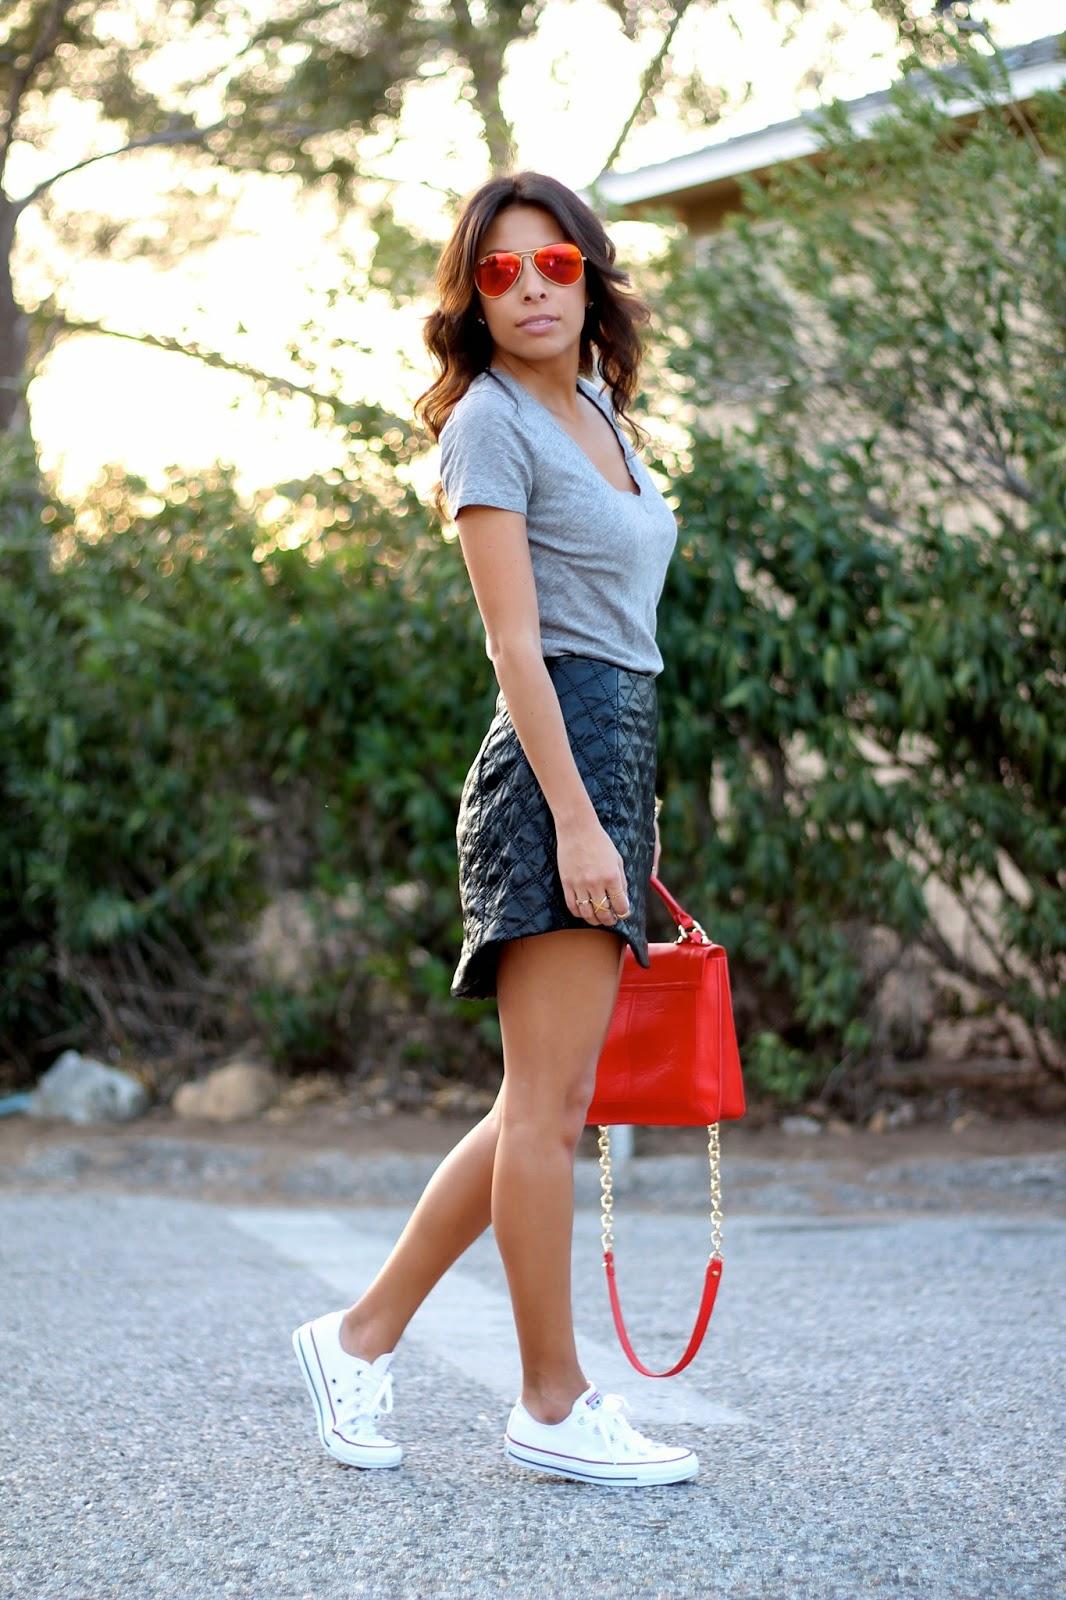 ray-ban sunglasses converse shoes sole society bag